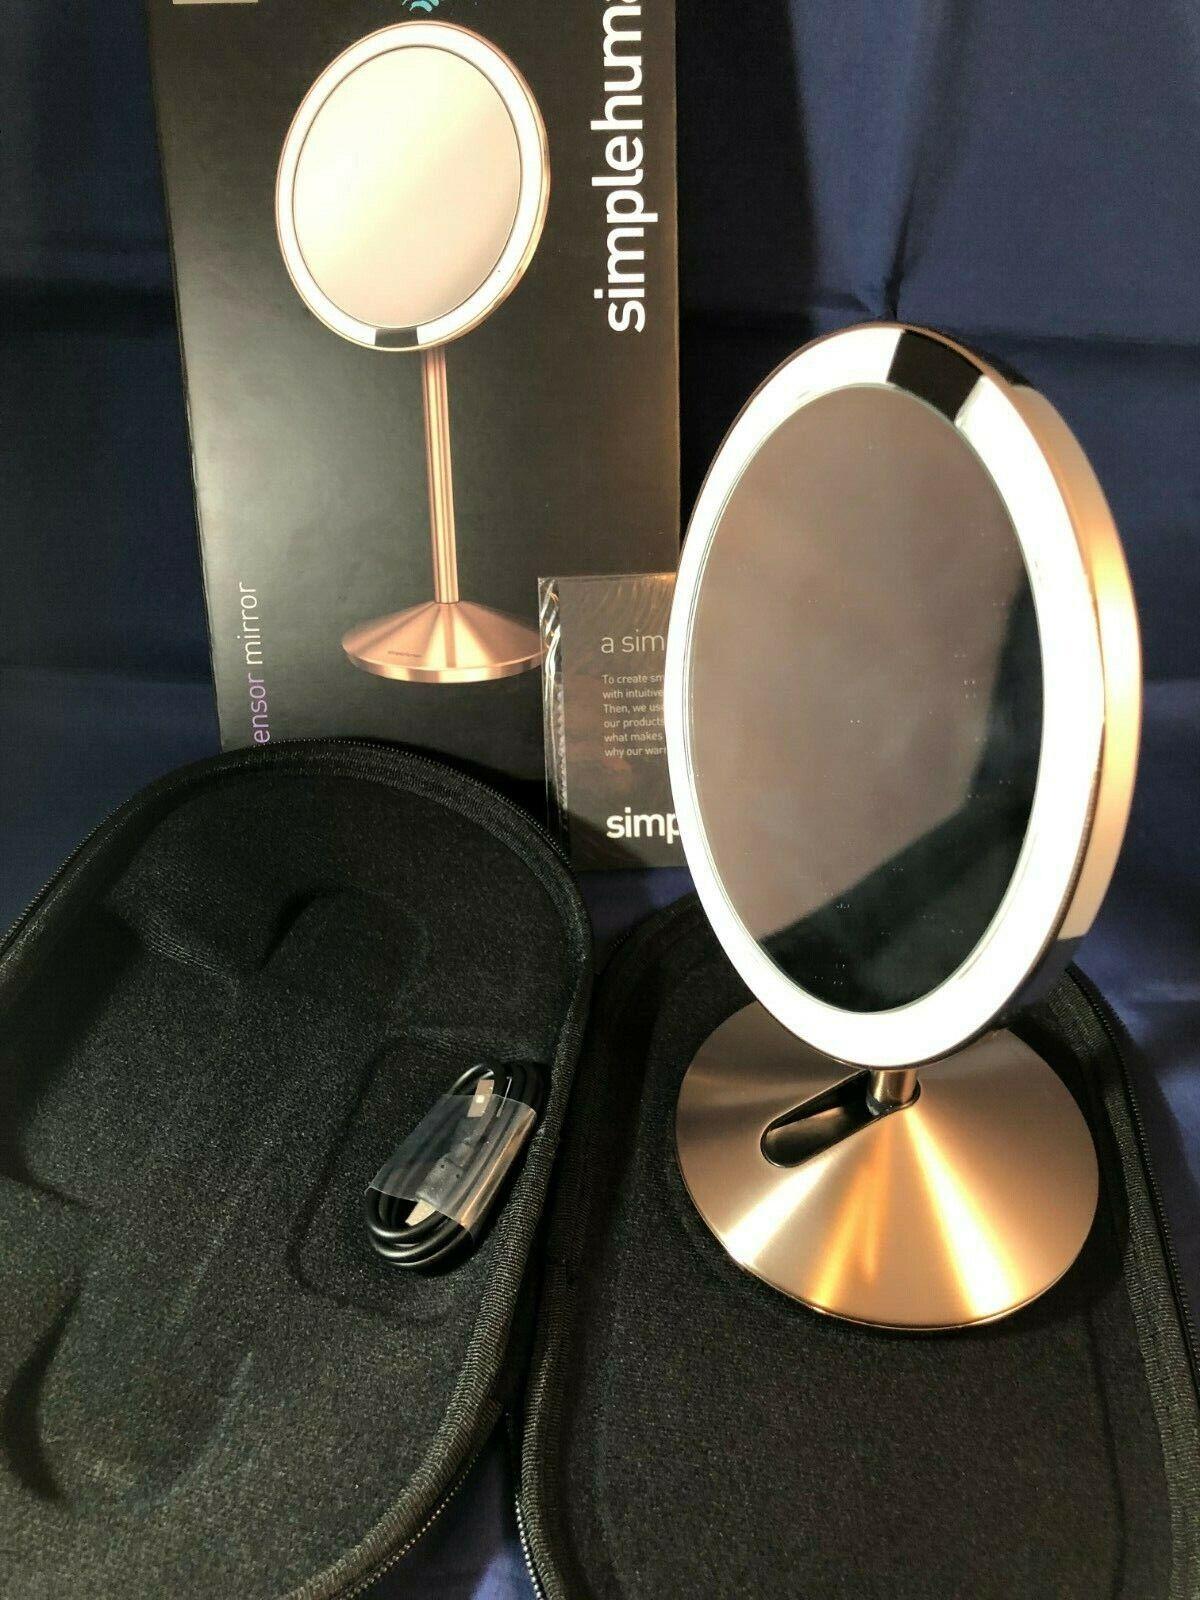 simplehuman 5 inch Sensor Mirror, Lighted Makeup Mirror, 10x